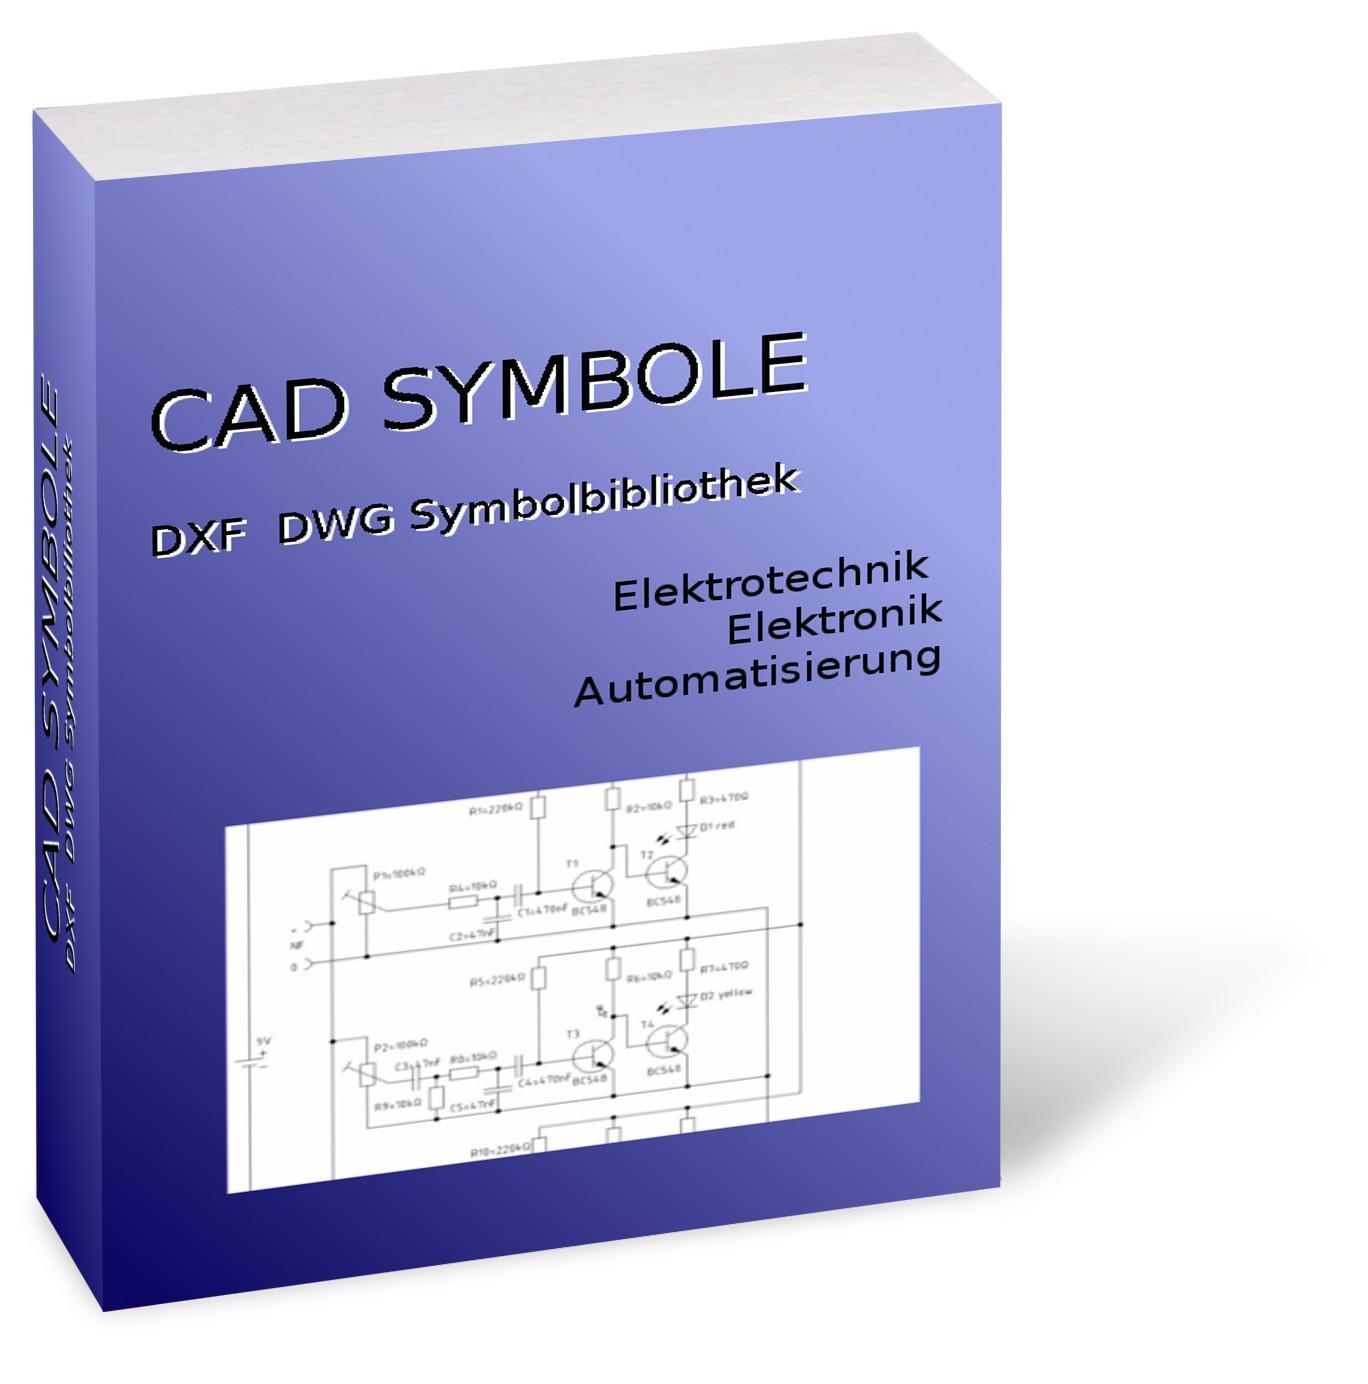 CAD Symbolbibliothek DXF / DWG - Elektronik Elektrotechnik Elektroinstallation